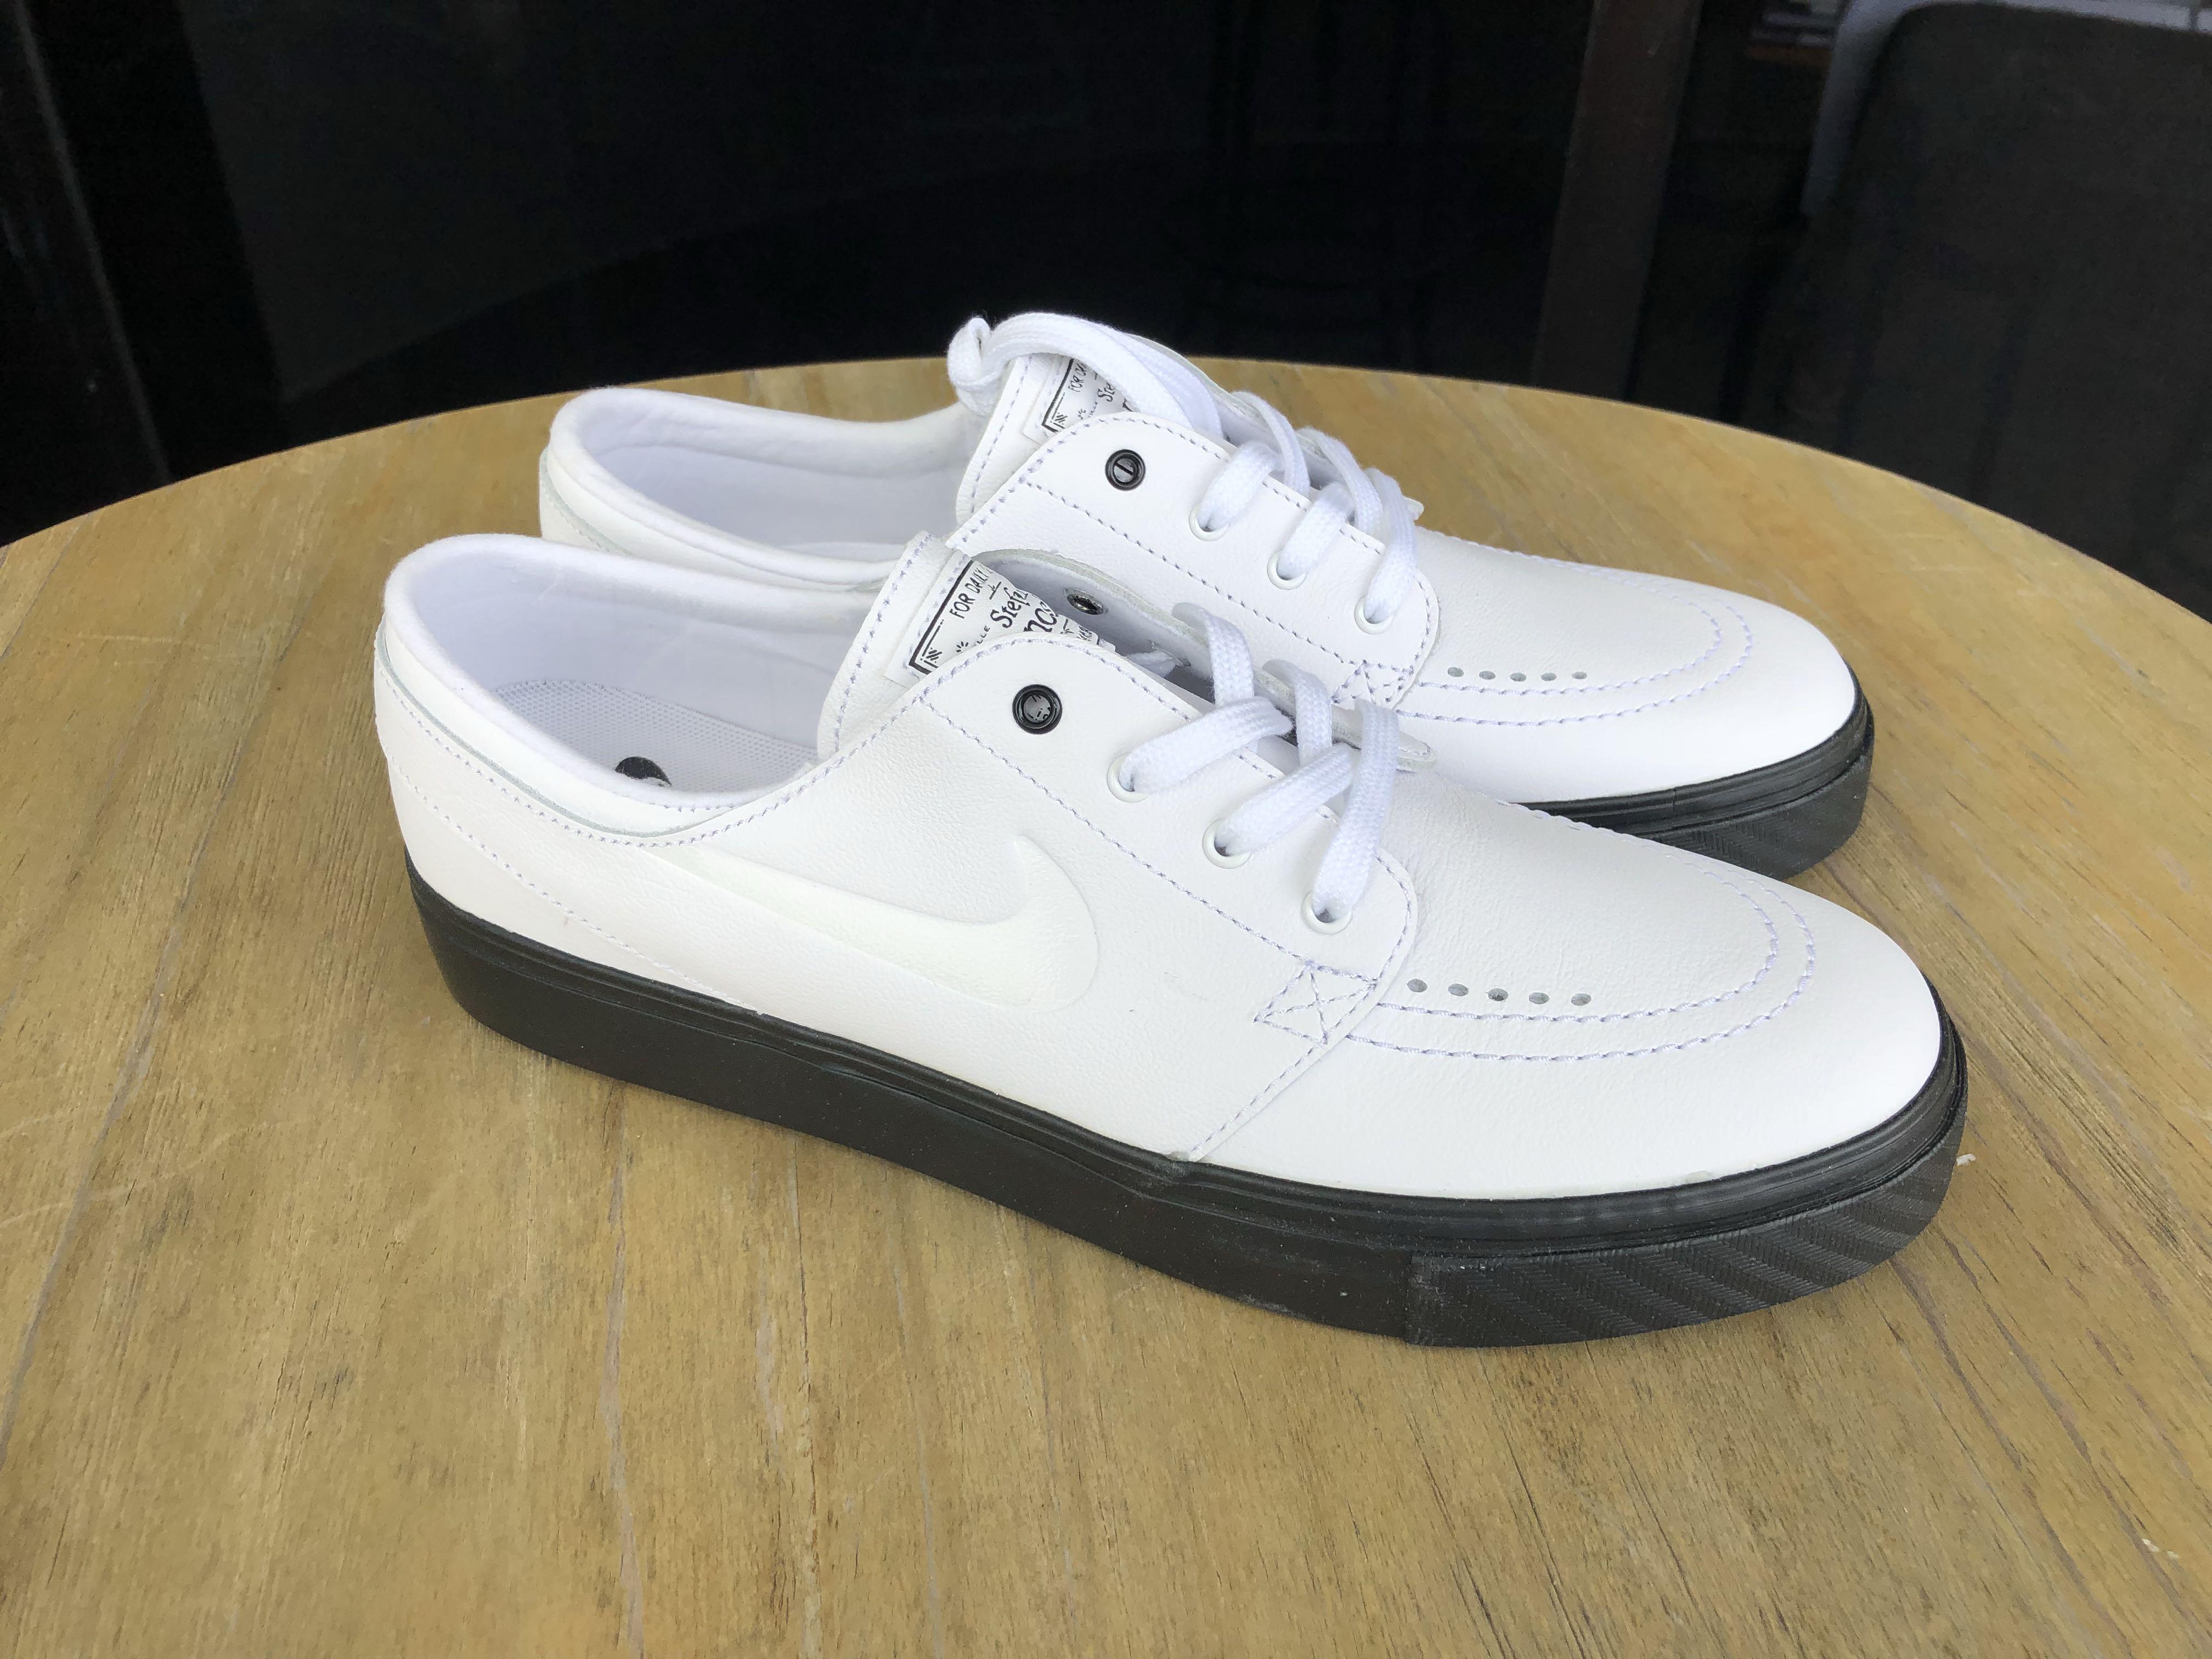 brand new eed71 2beaf Nike SB Zoom Stefan Janoski Premium US 6.5 Men   US 8 Women, Men s ...